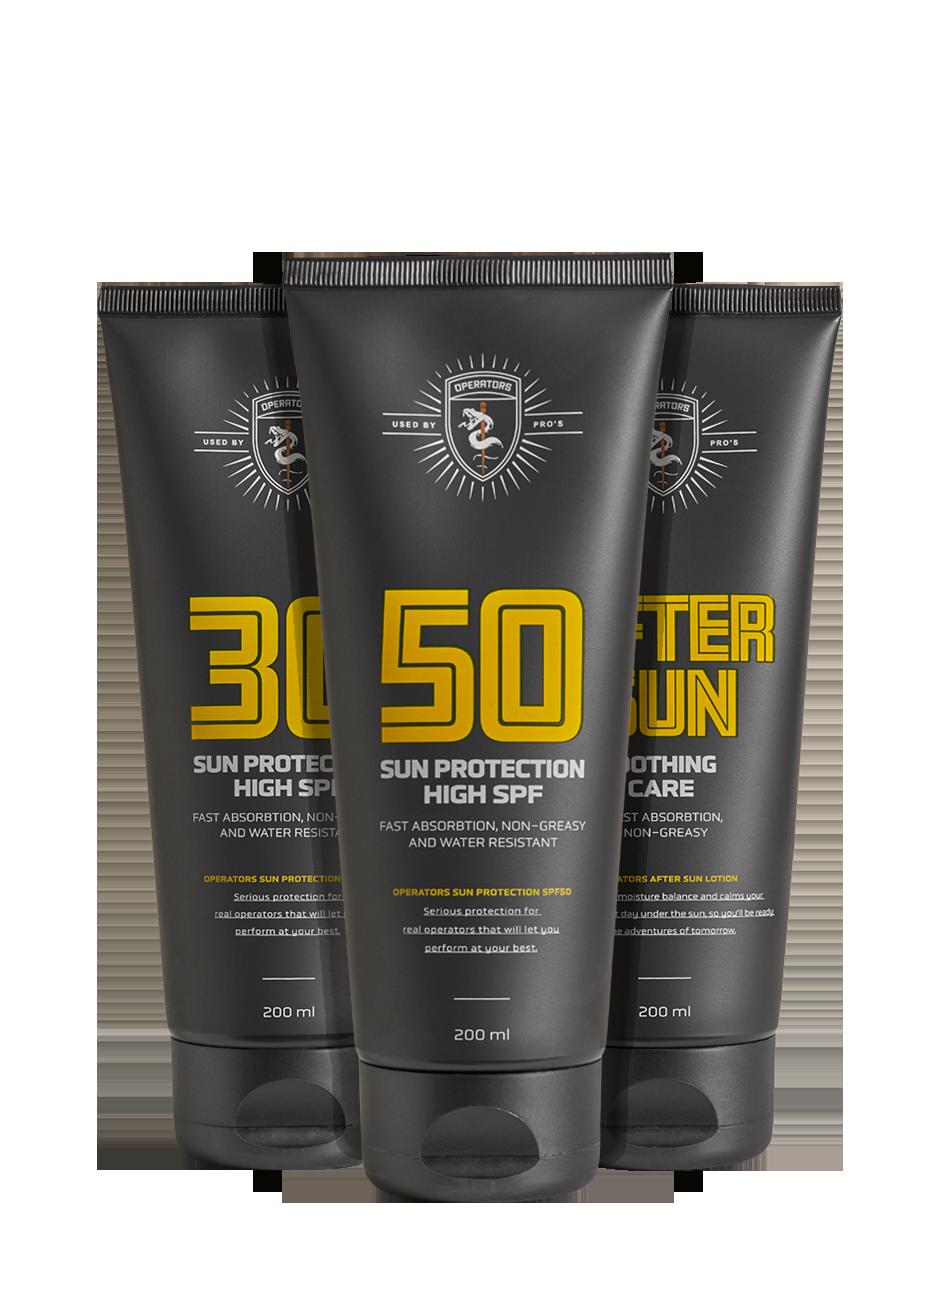 Sun protection SPF 30/50